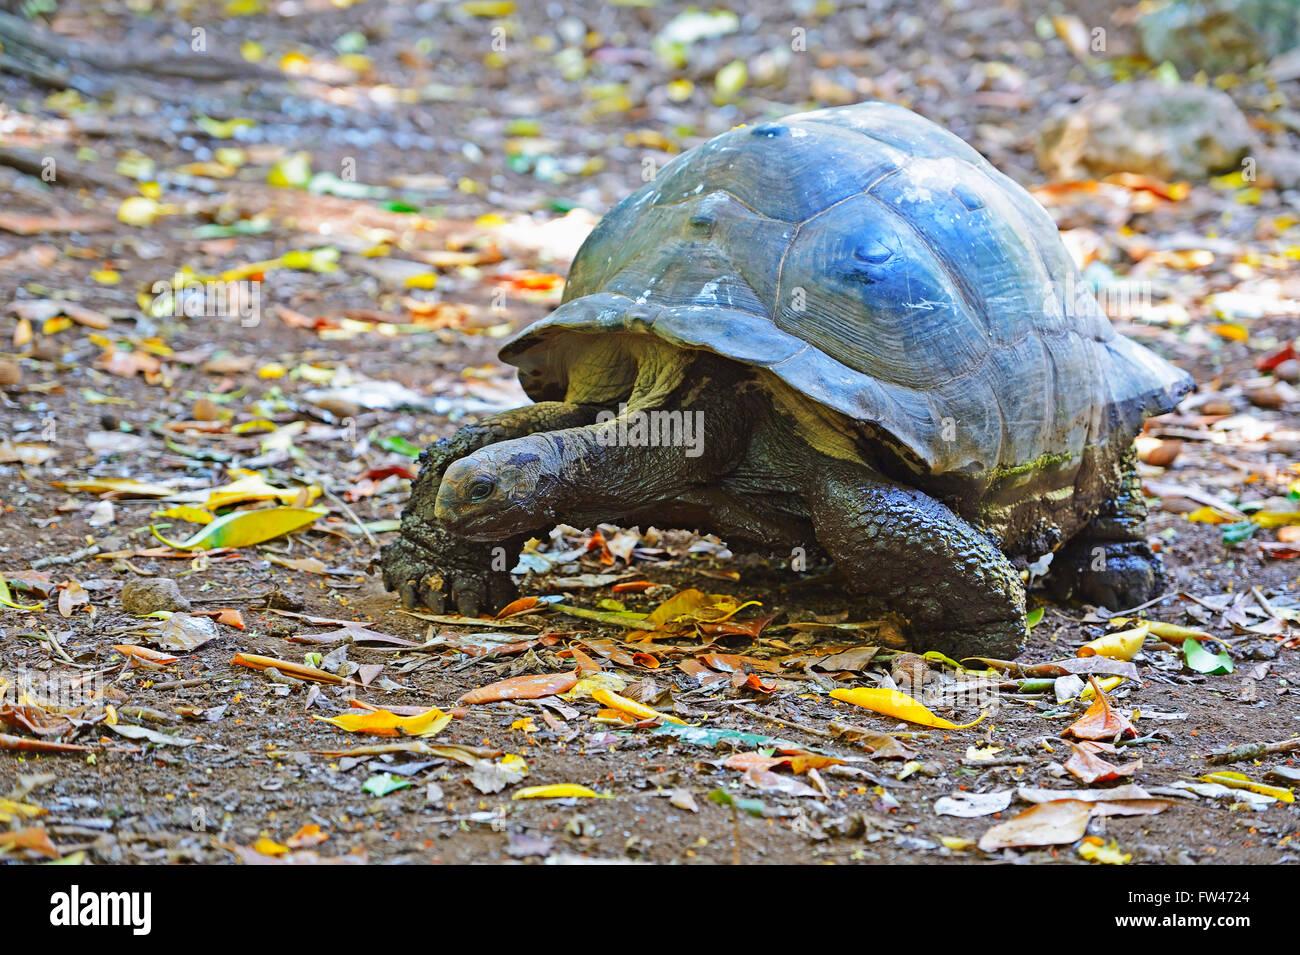 Aldabra-Riesenschildkroete (Geochelone gigantea), Insel Cousin, Seychellen - Stock Image